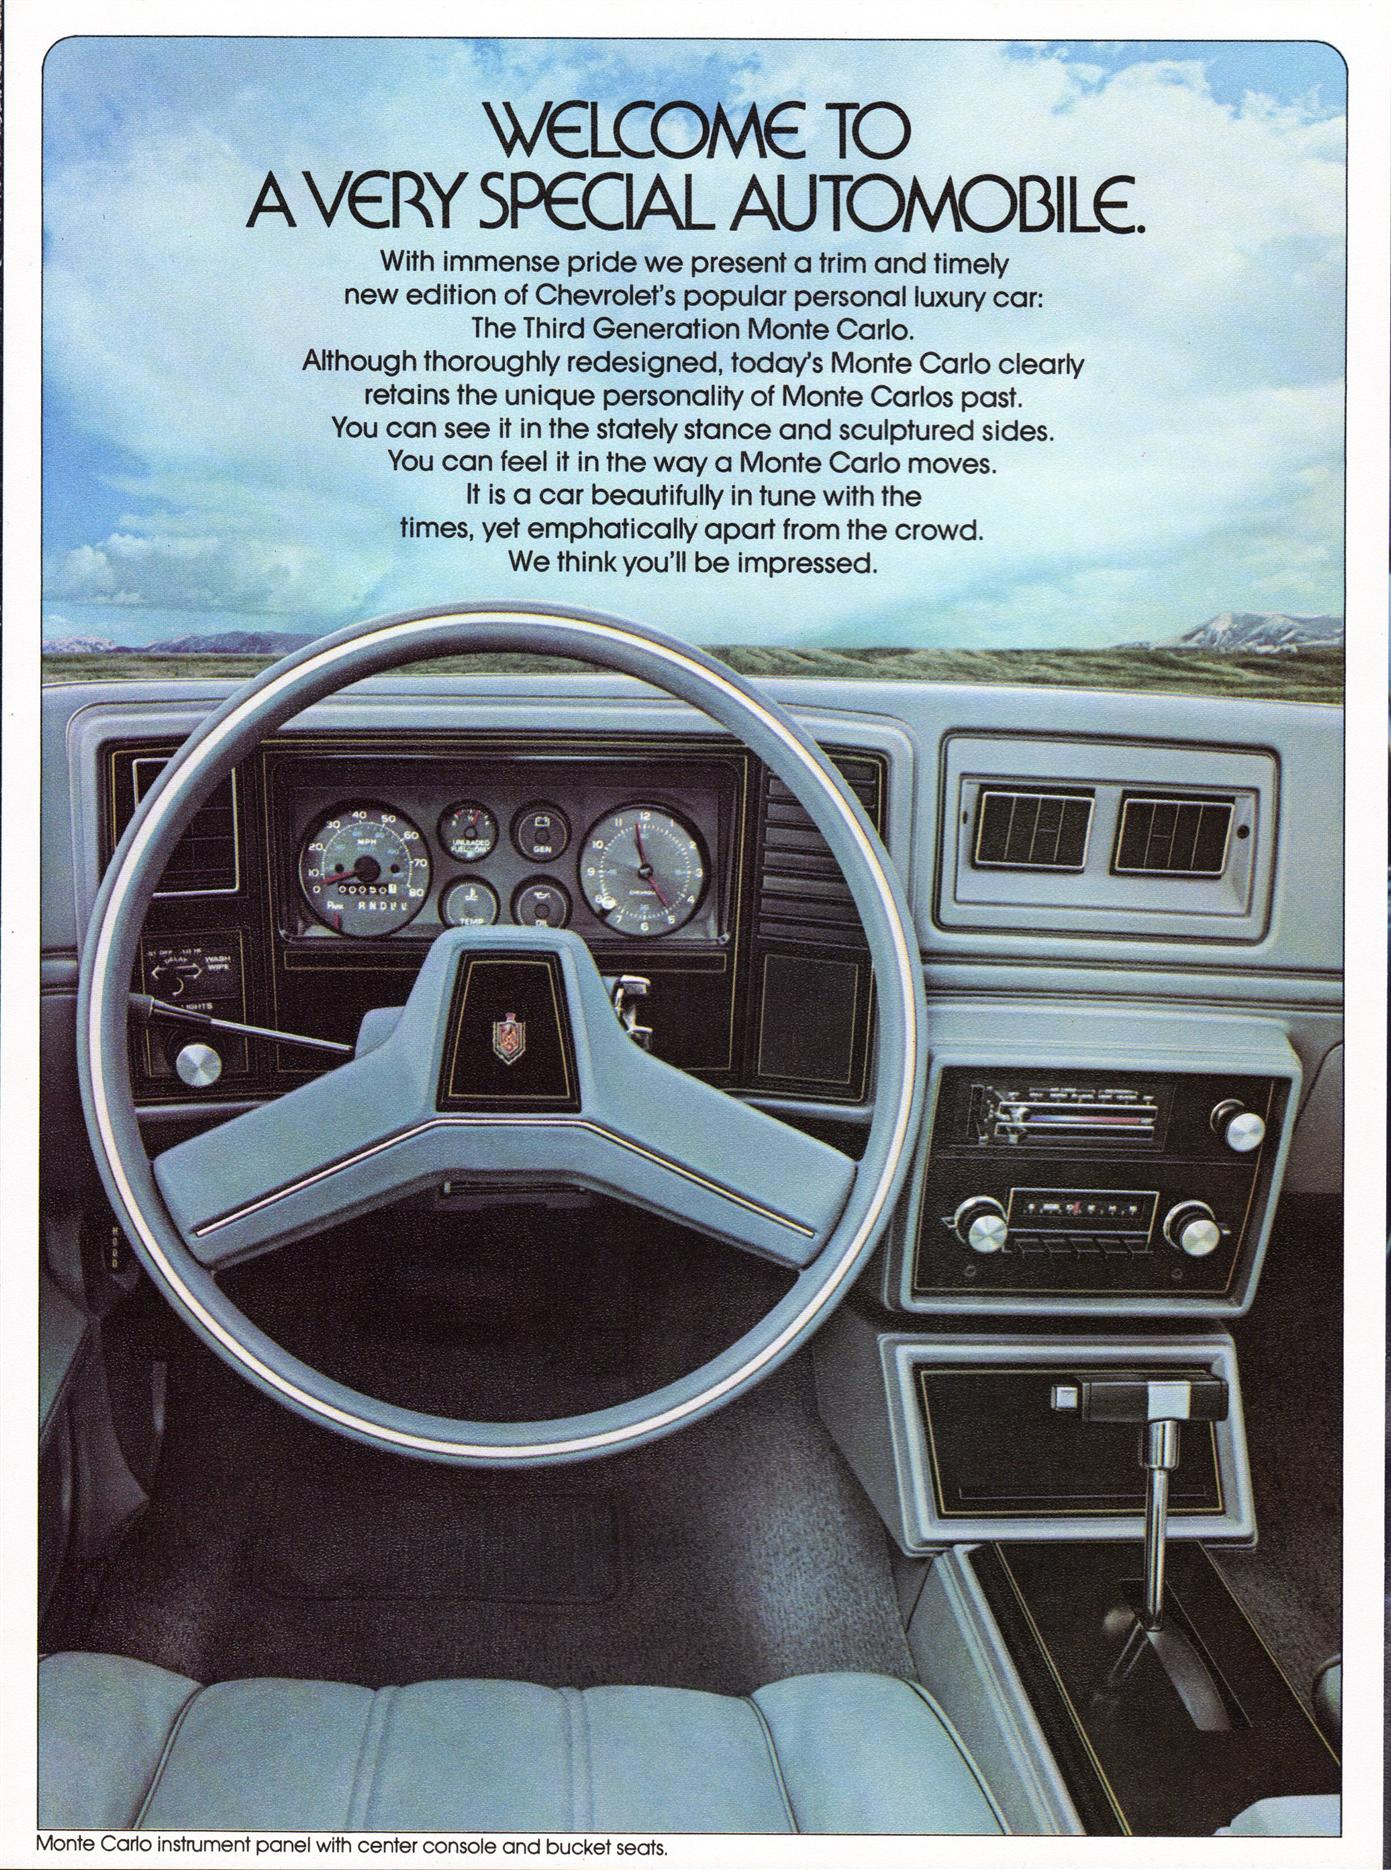 Filename: 1978 Chevrolet Monte Carlo-02.jpg